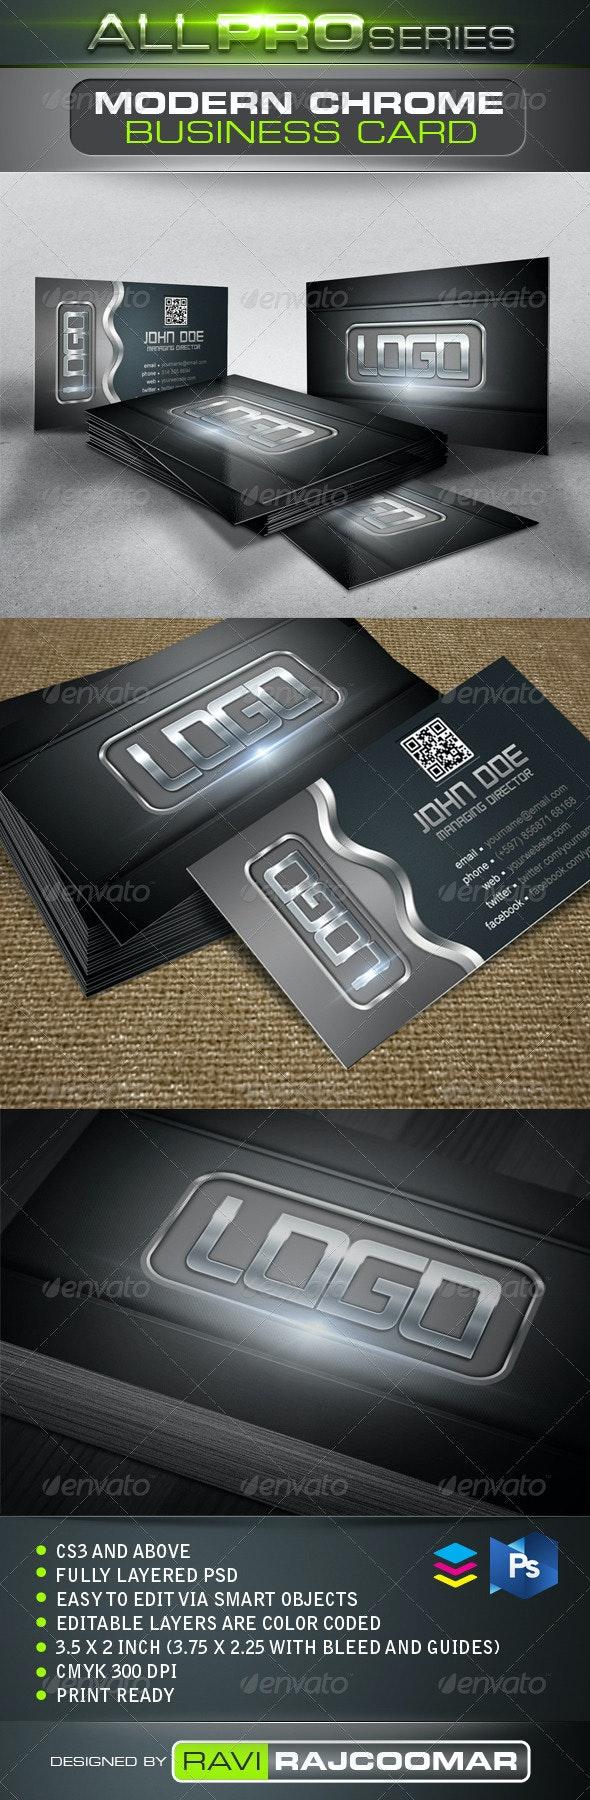 Modern Chrome Business Card - Business Cards Print Templates